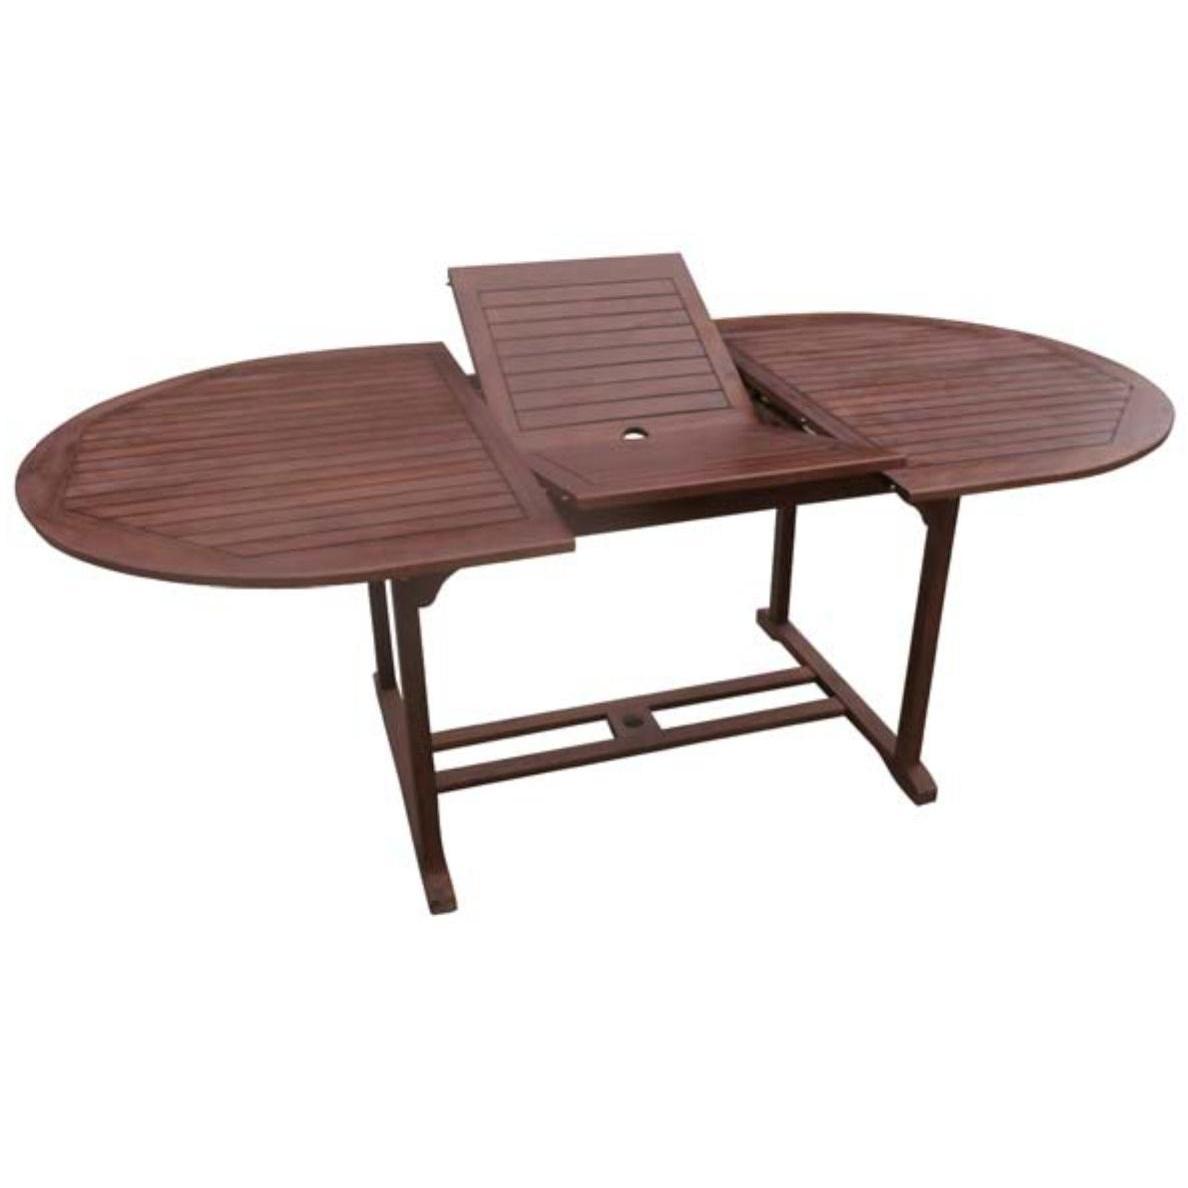 Extending Oval Table 200 150 50 X100 Acacia